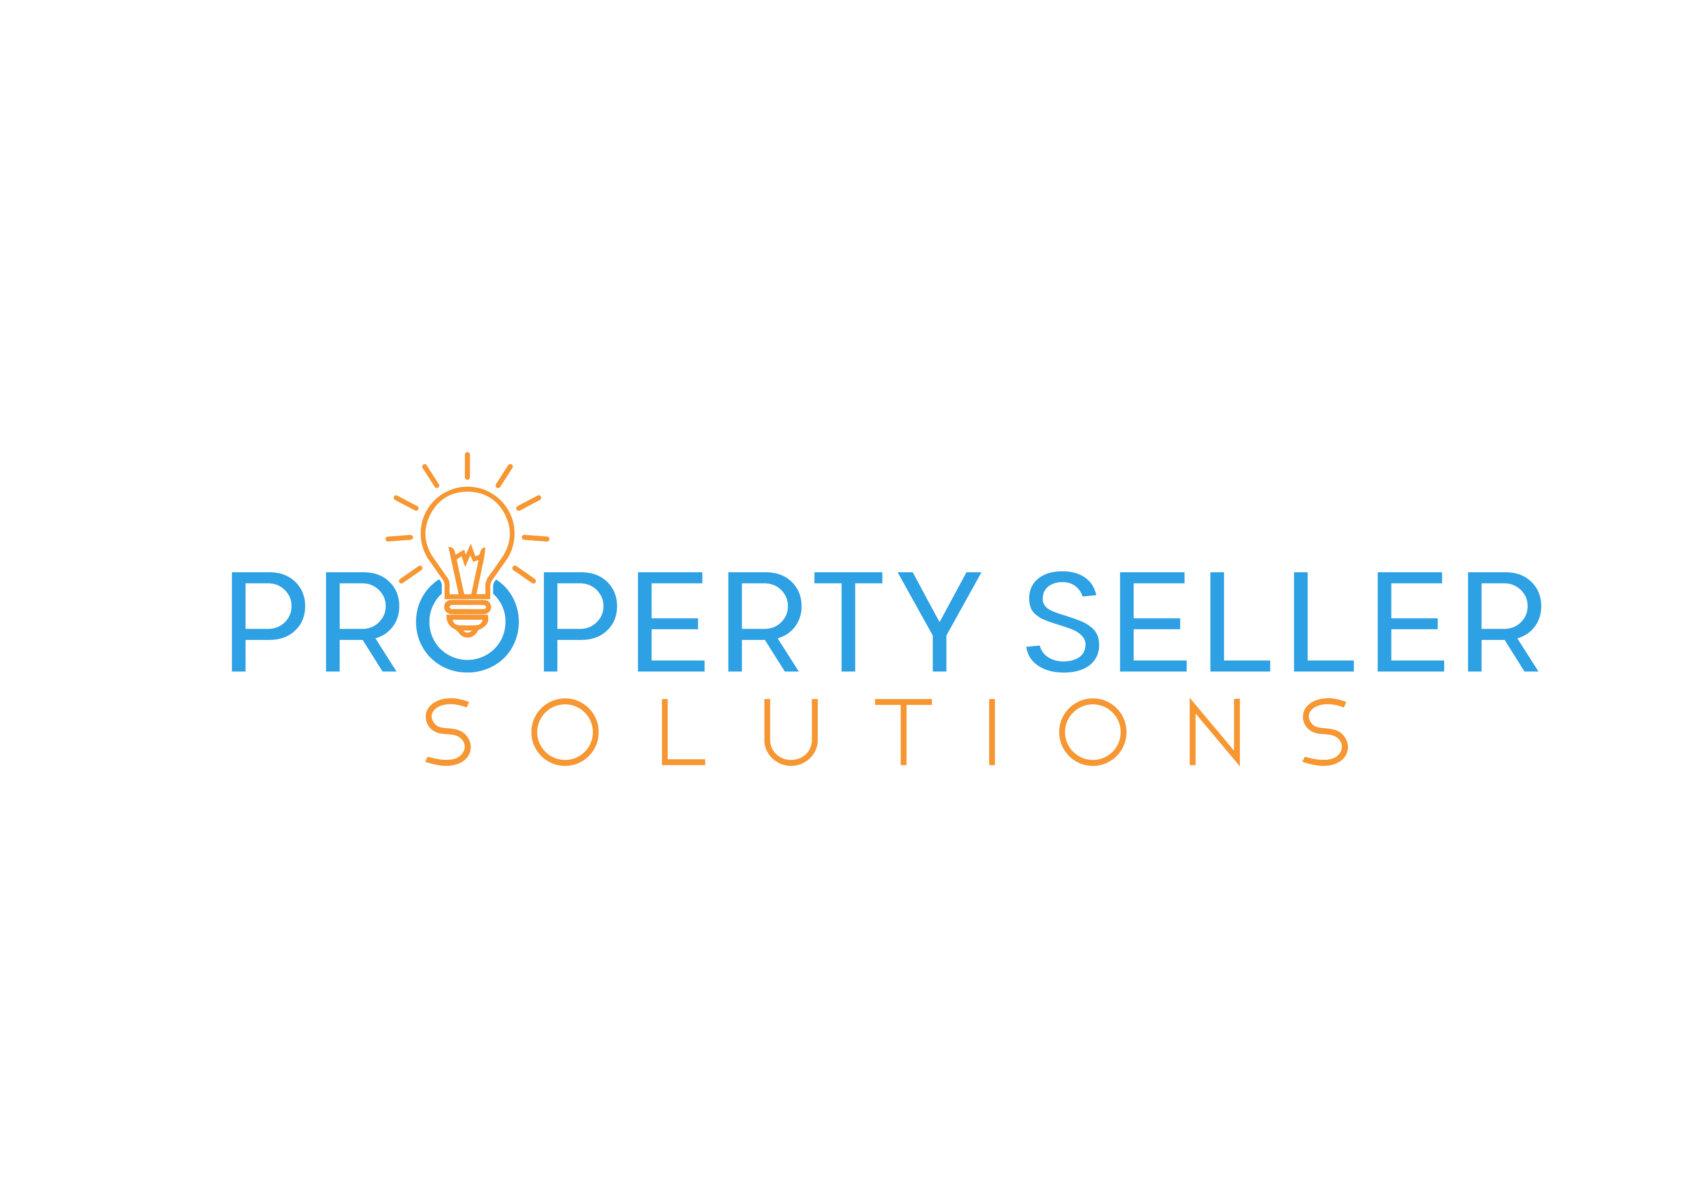 Property Seller Solutions logo